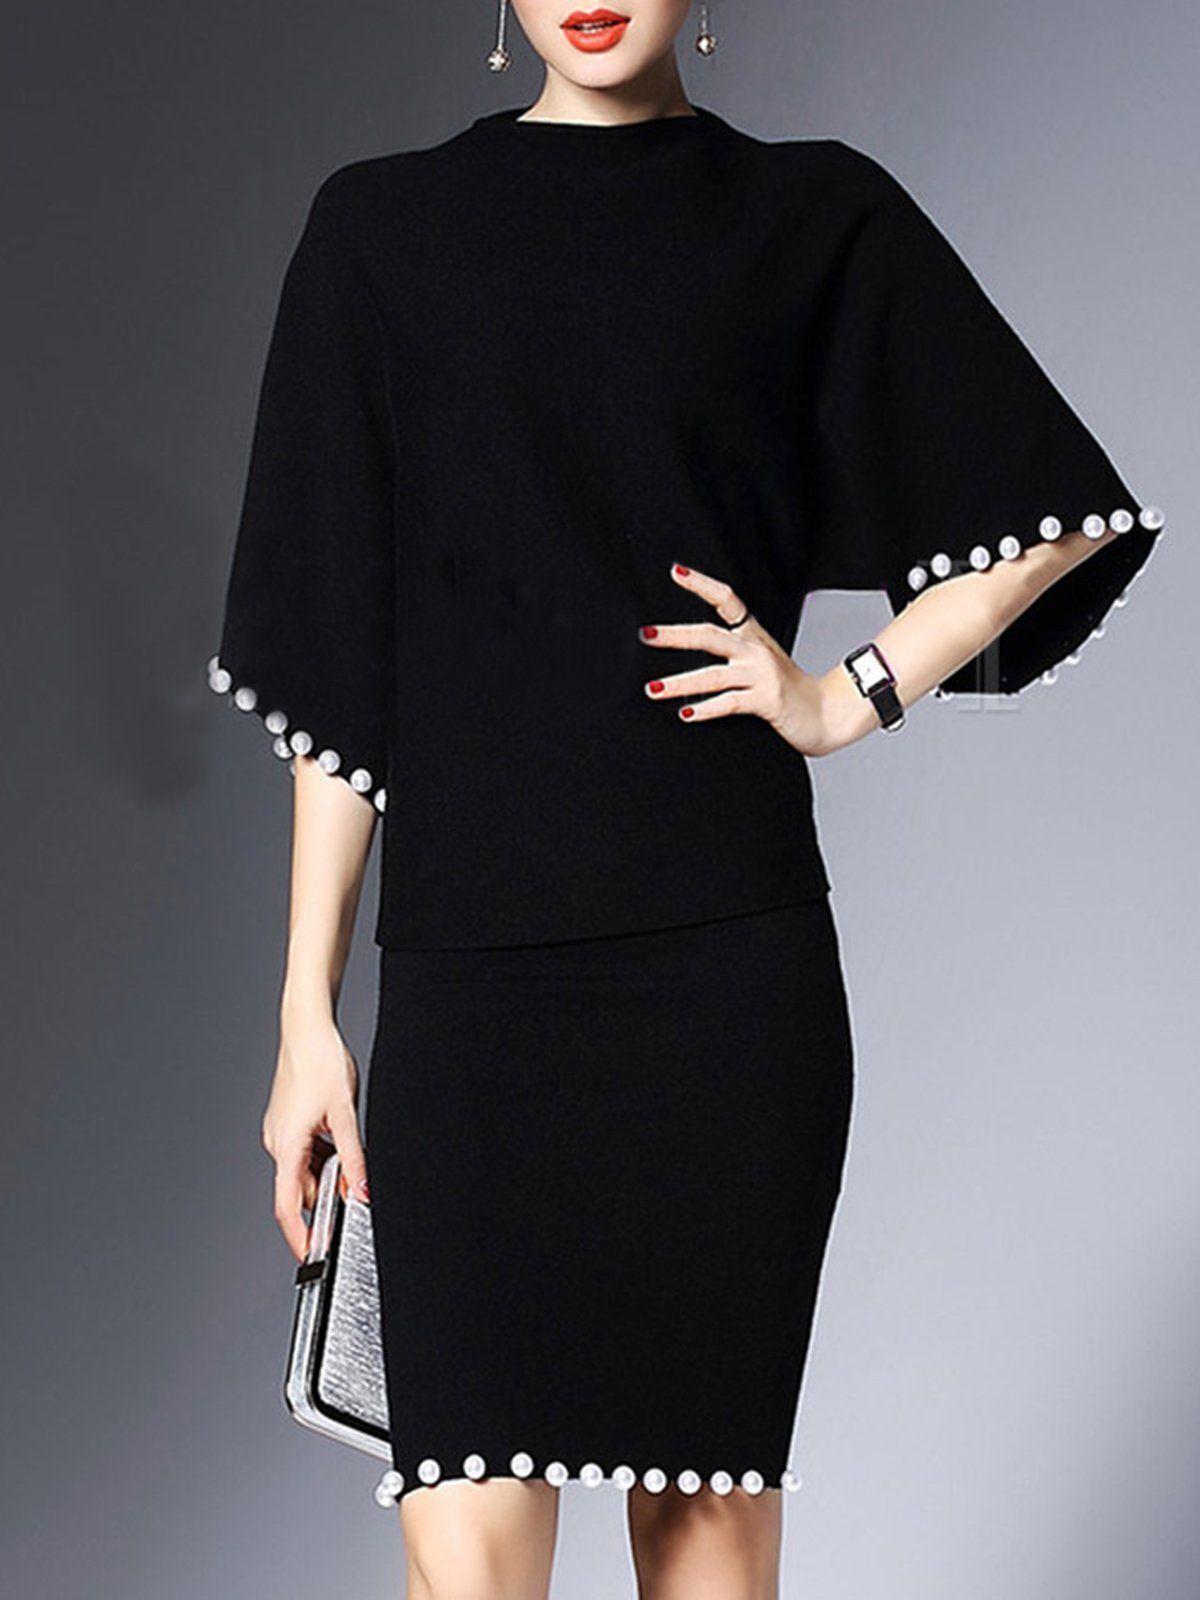 Styletoto Elegant Elegant Set For Women Black Beaded Outfits Styletoto Fashion Jumpsuit Shopping Clothes